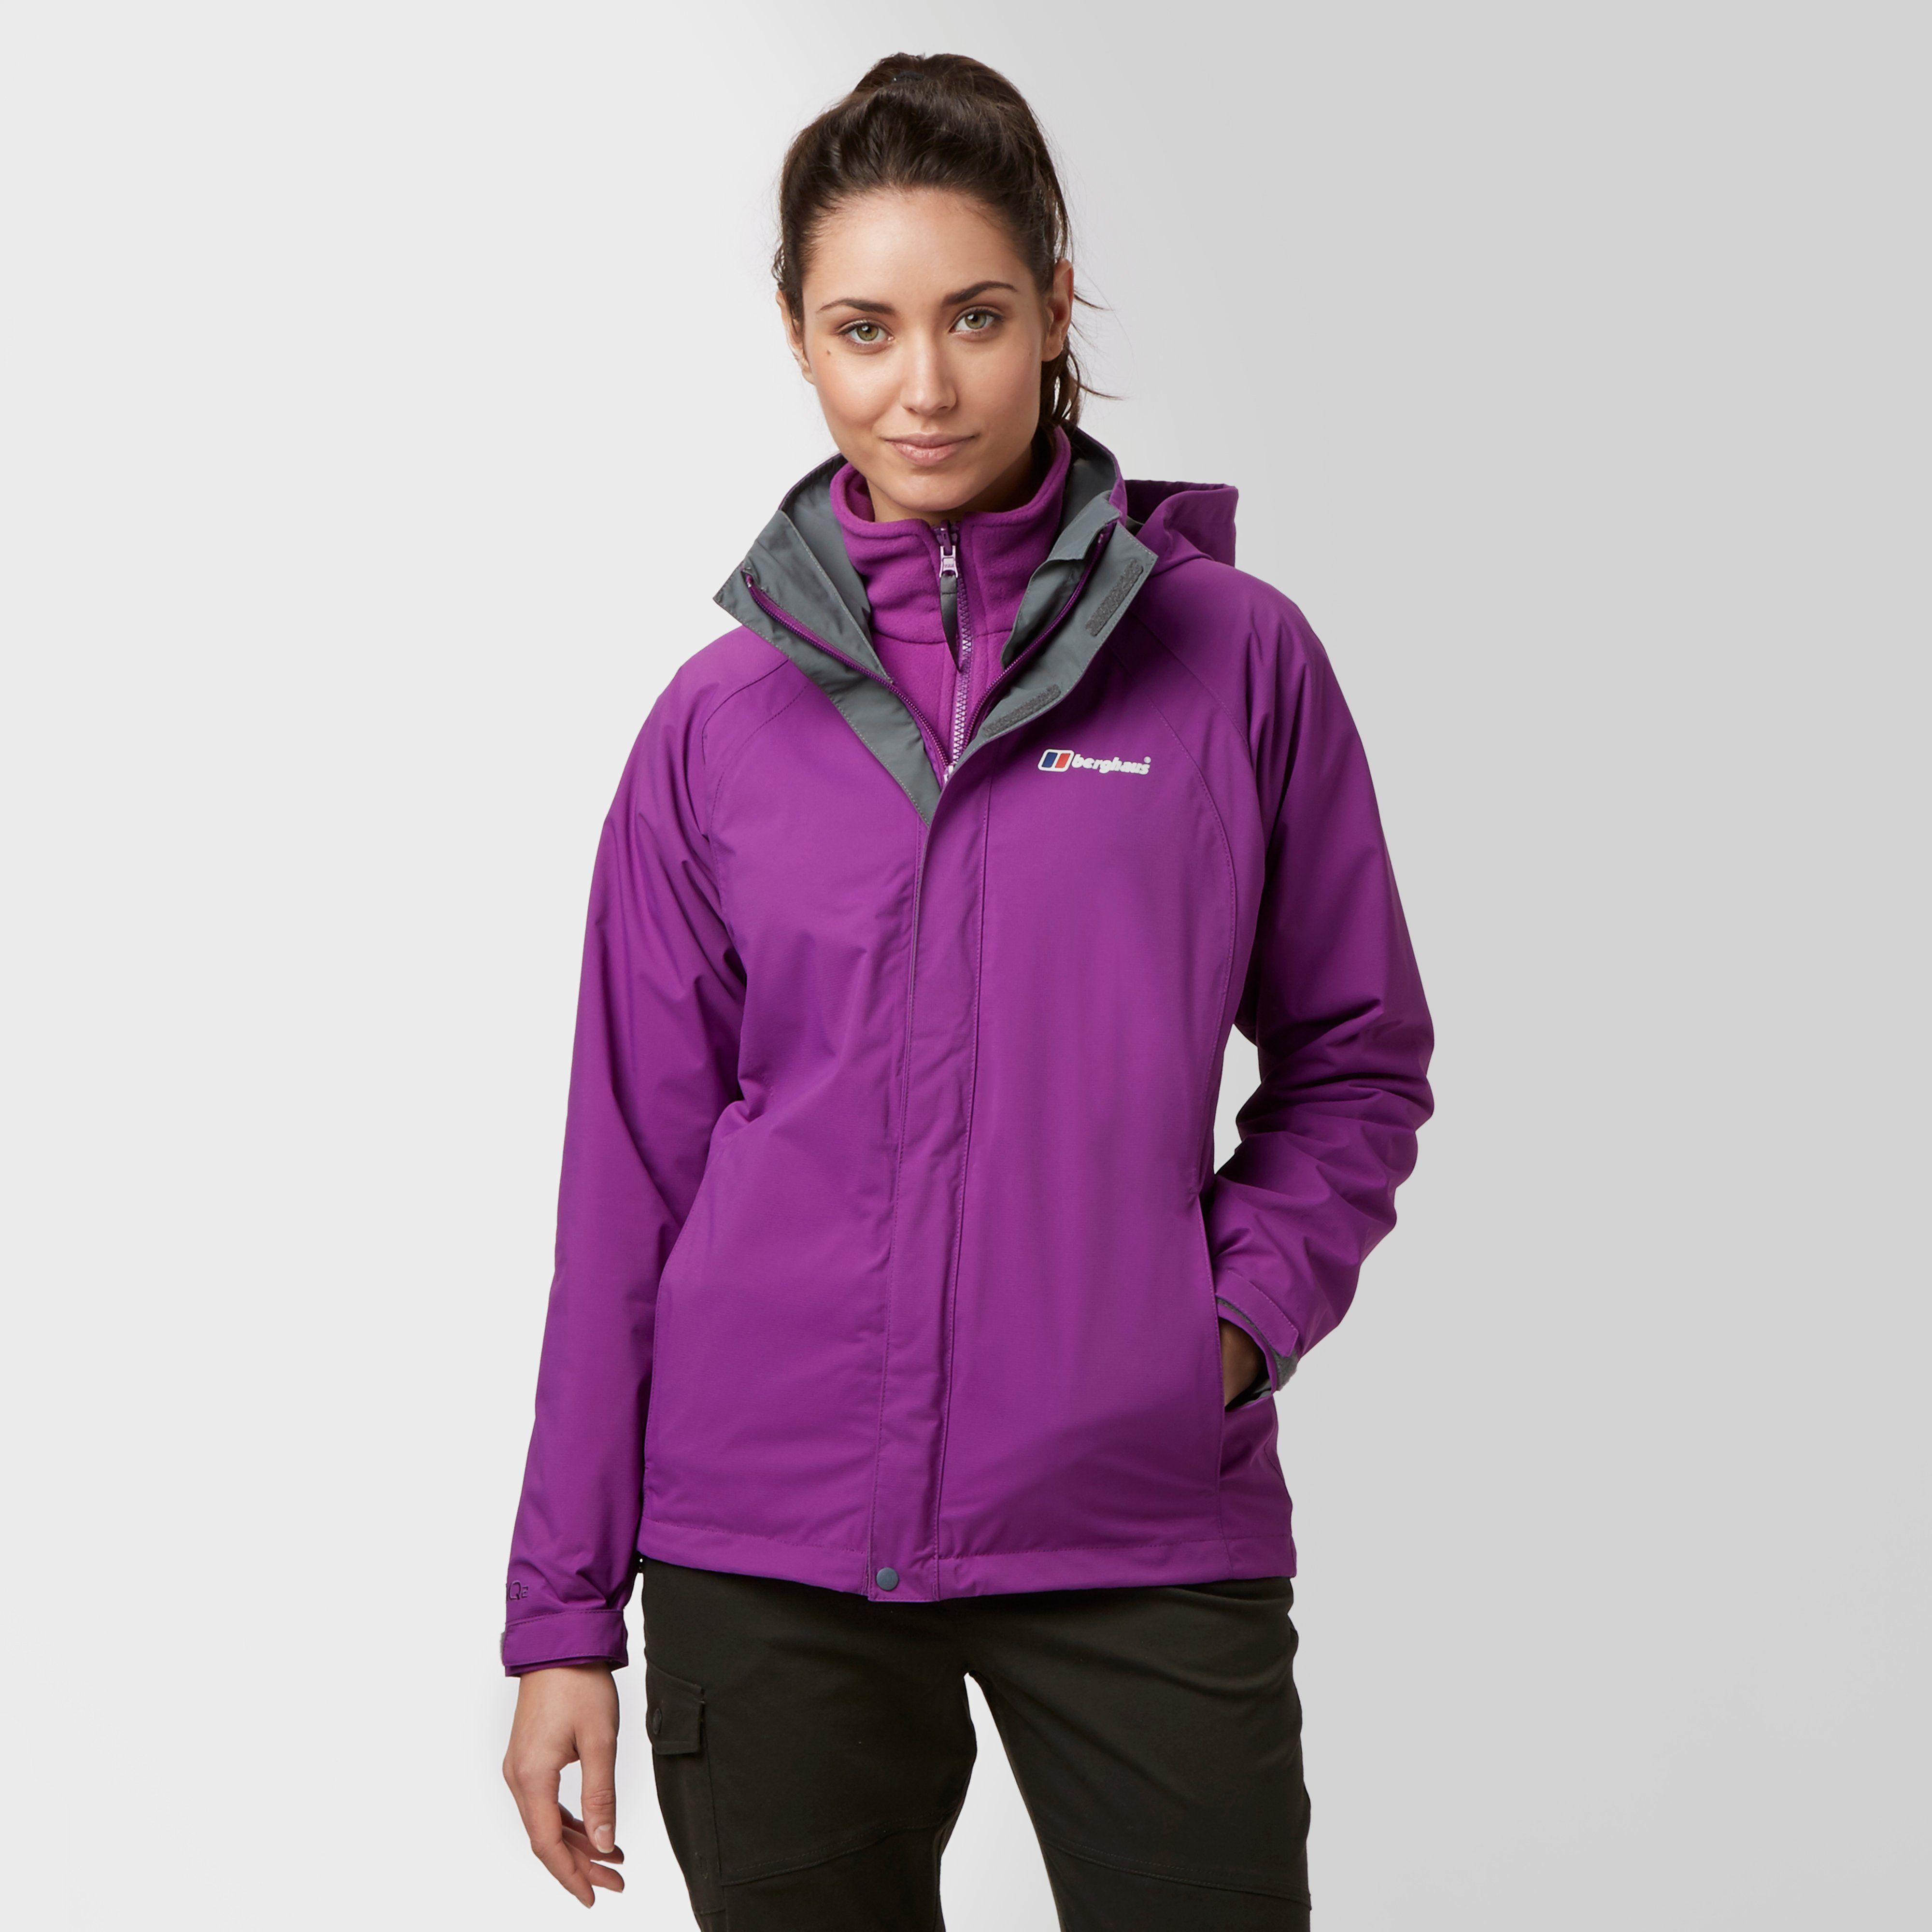 BERGHAUS Women's Calisto 3 in 1 Jacket